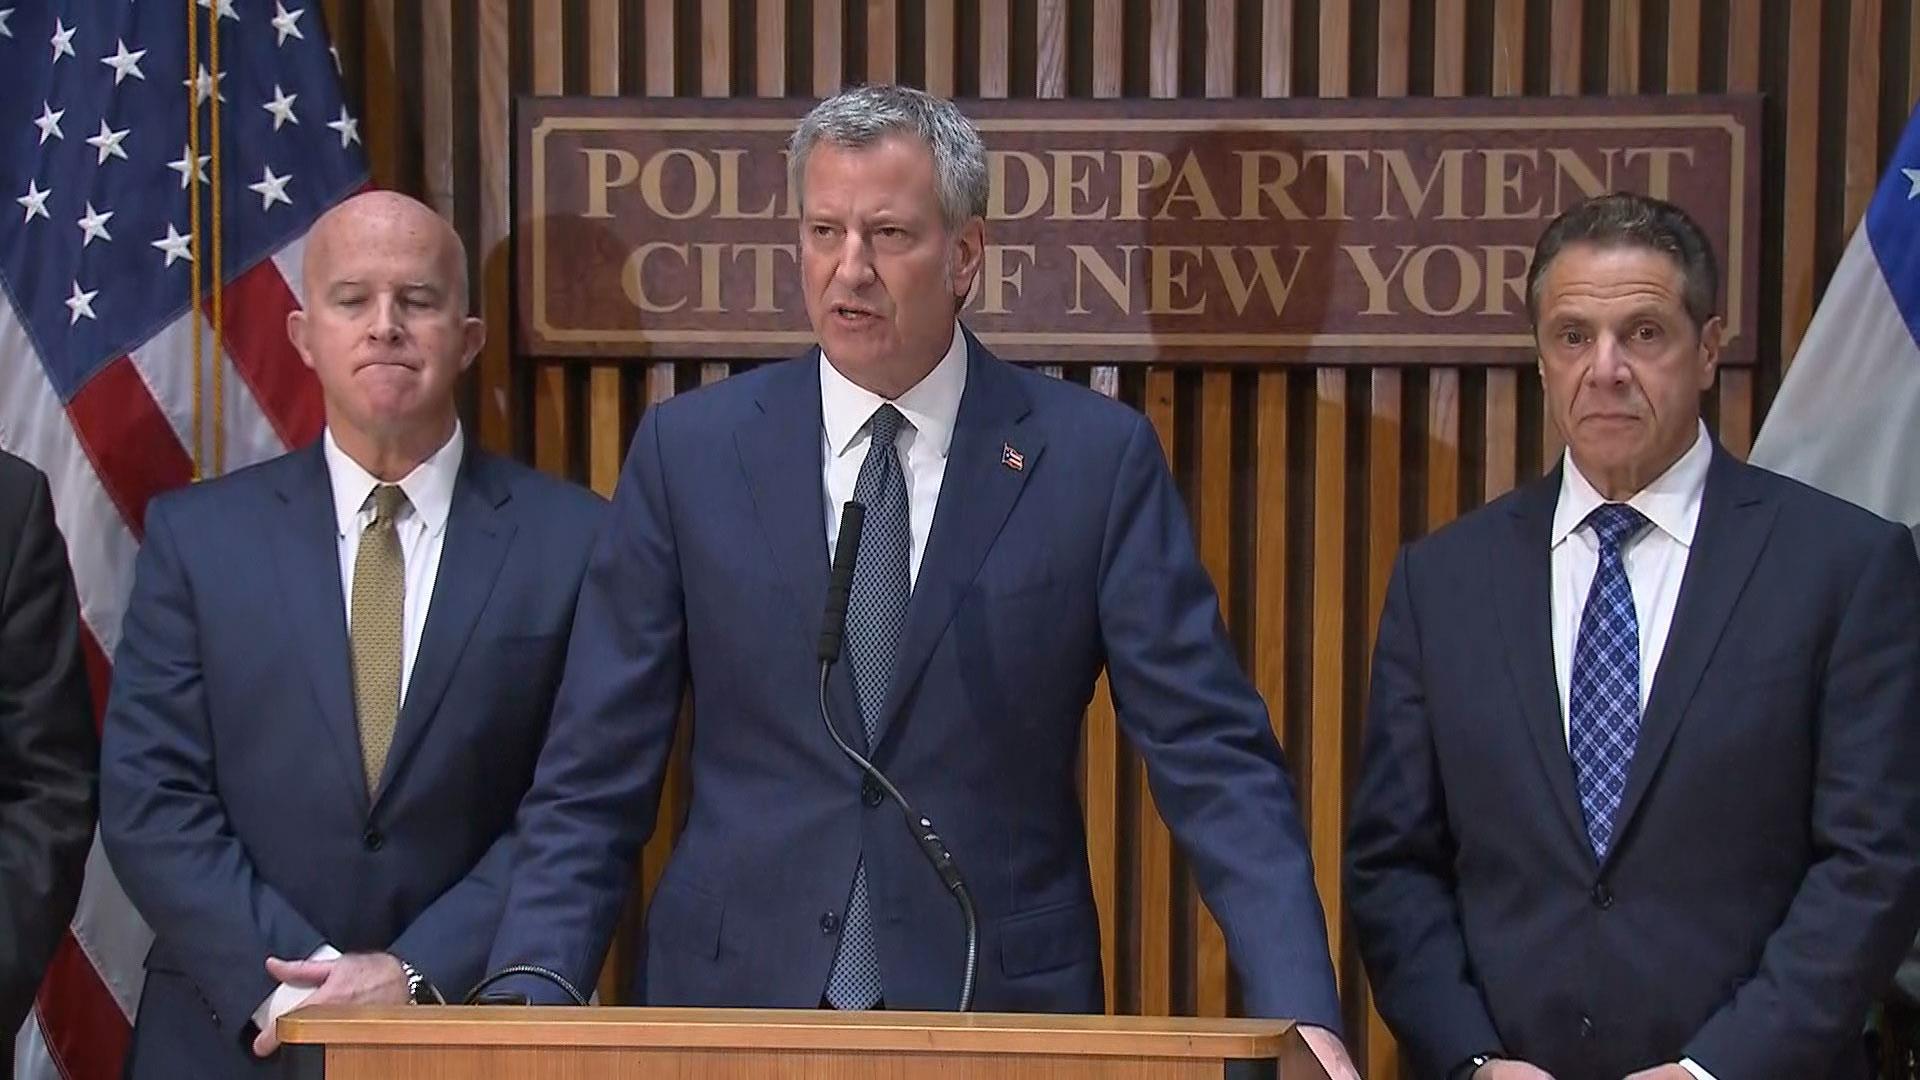 New York Terrorist Attack: Truck Driver Kills Eight in Lower Manhattan